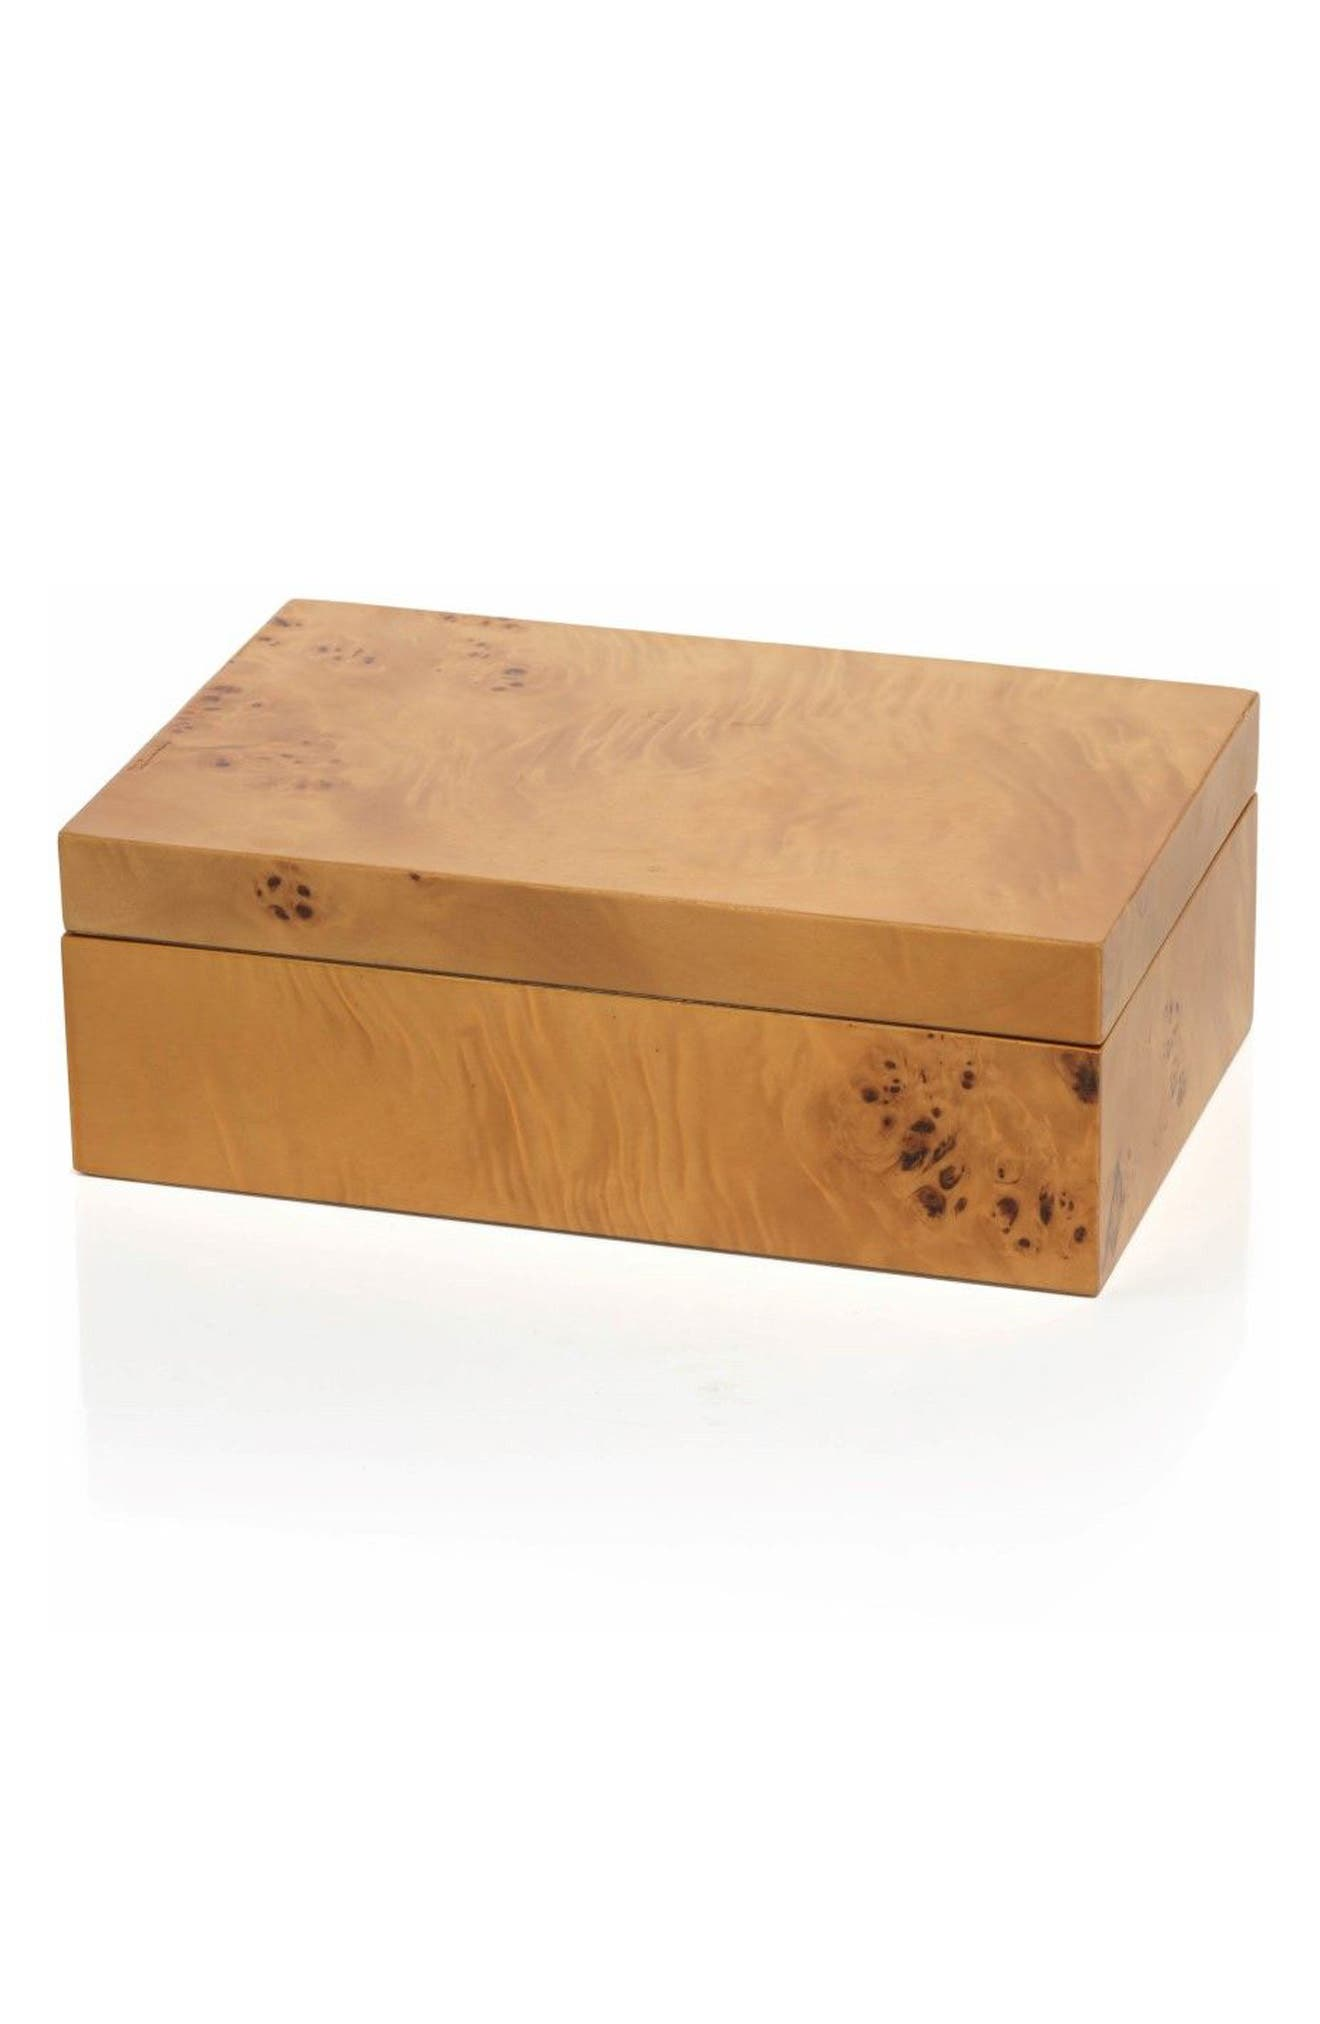 Zodax Small Manik Jewelry Box